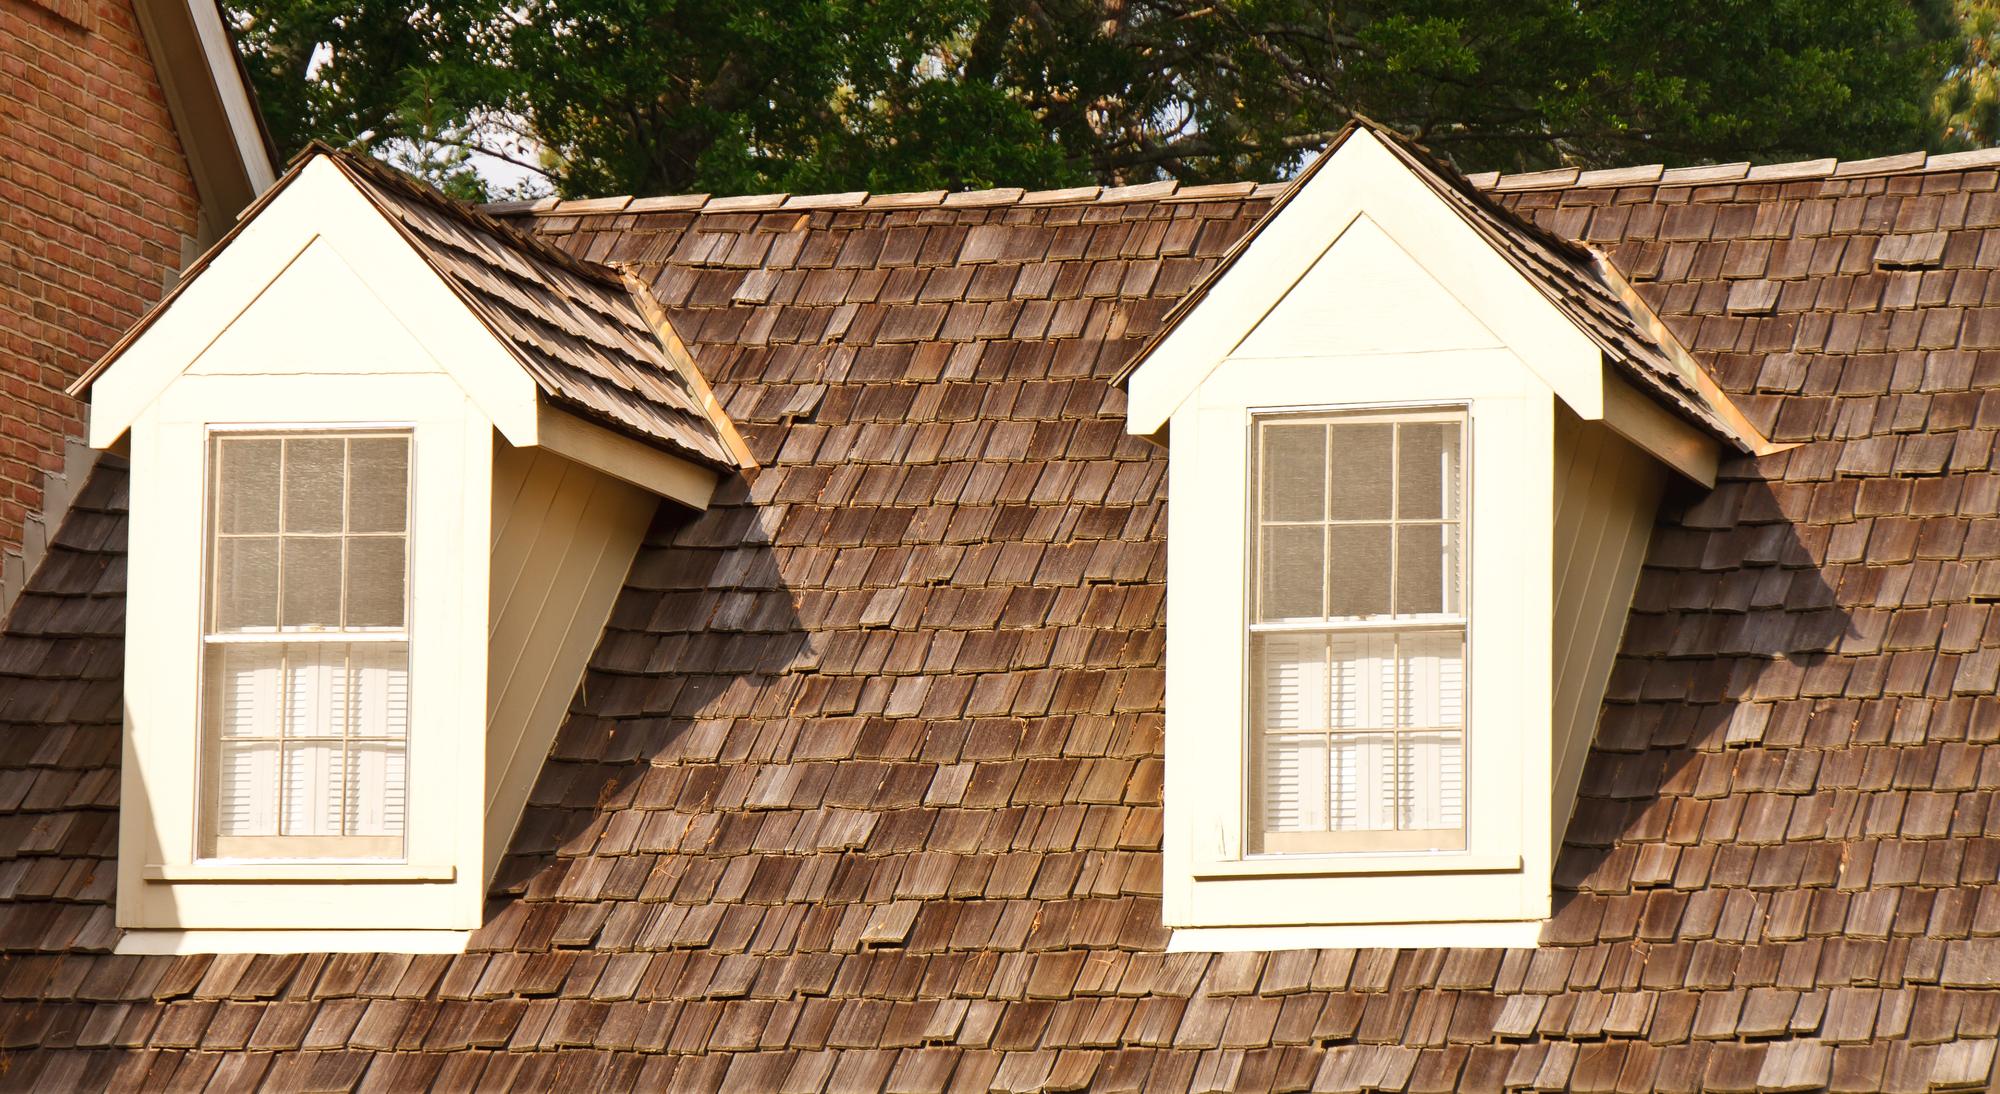 Wood Shingle Roof with Dormers